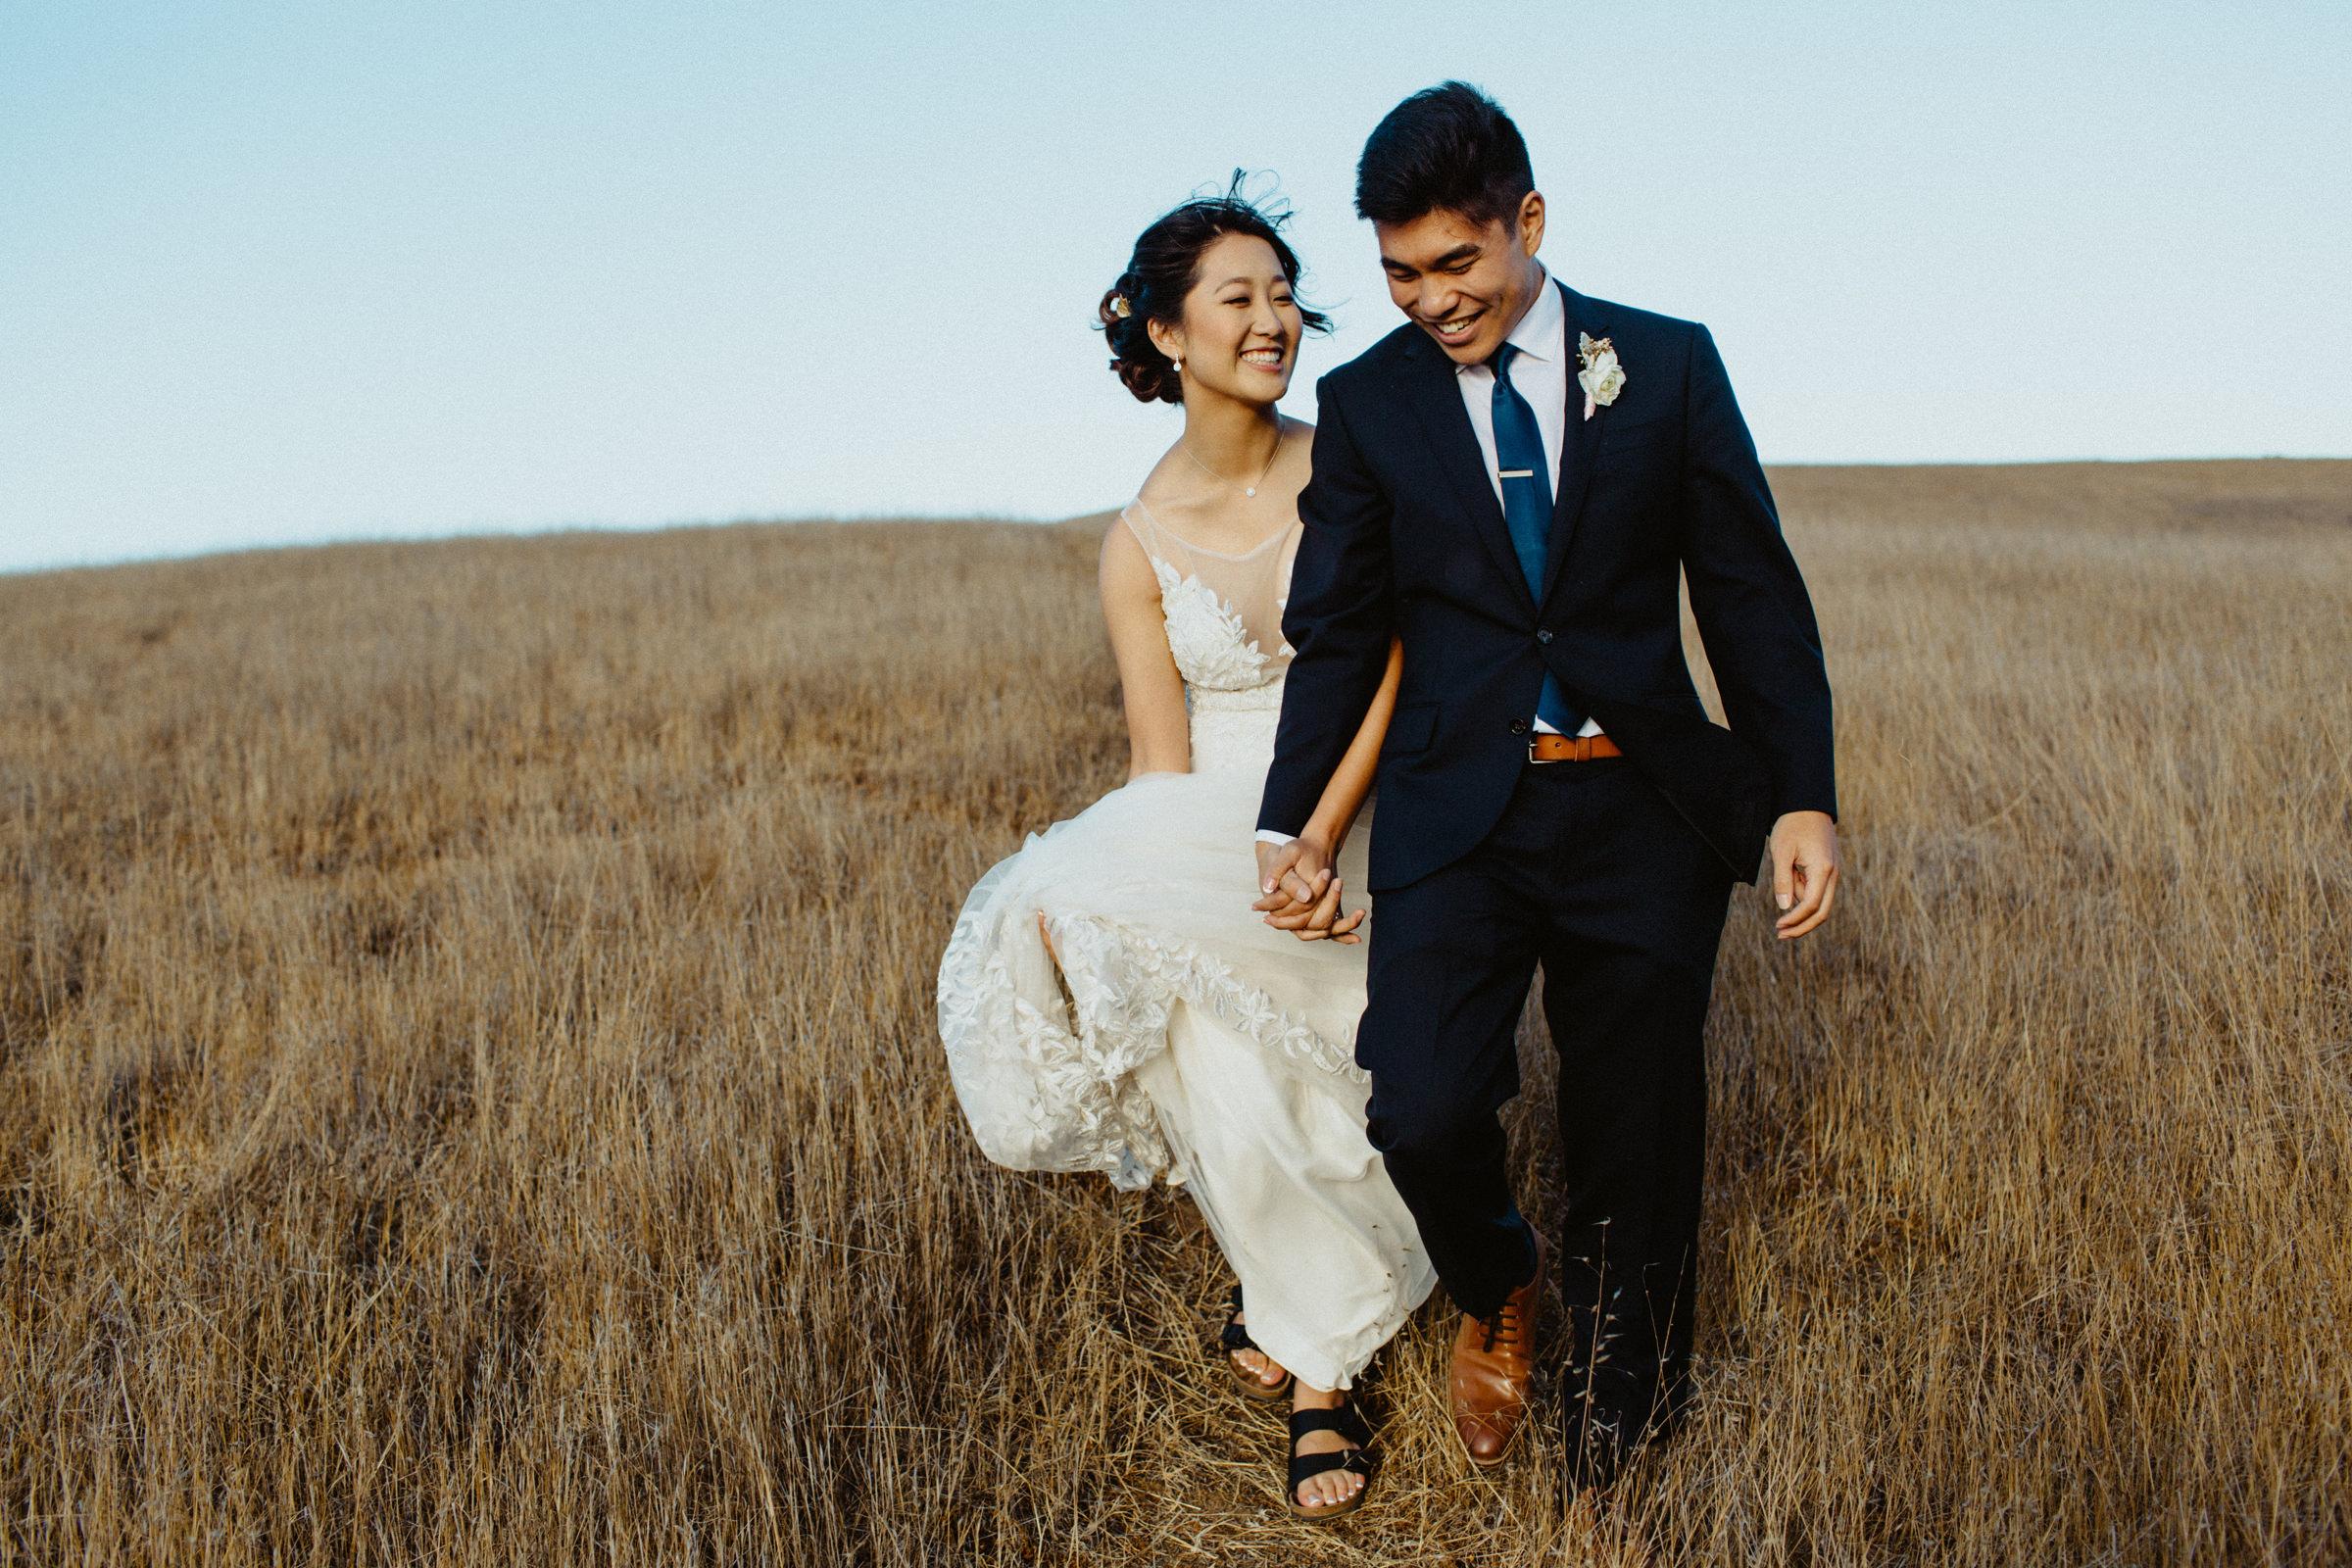 Why I'm a wedding photographer -